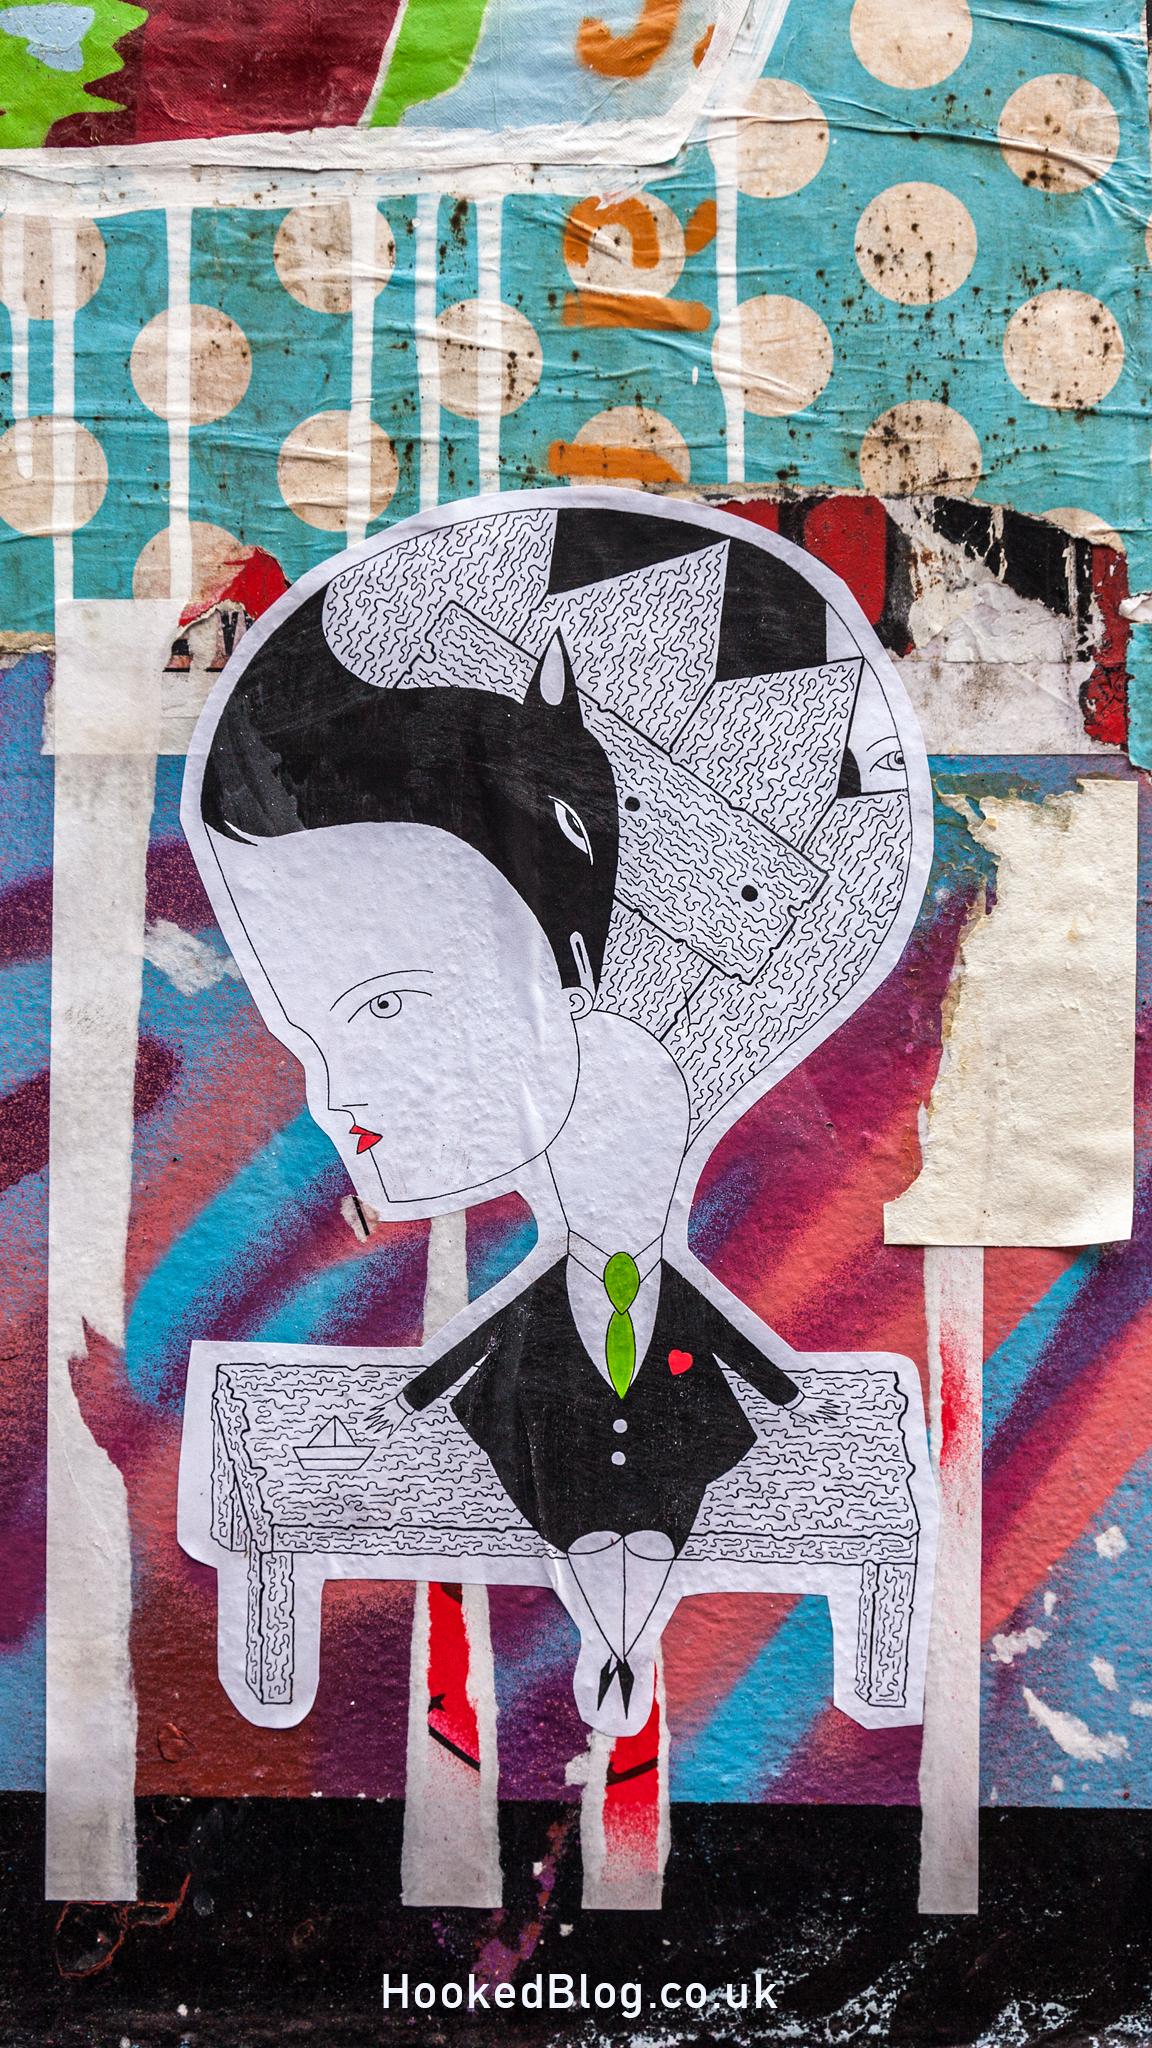 French Street Artist Fred Le Chevalier in Shoreditch, London. Photo ©Hookedblog / Mark Rigney